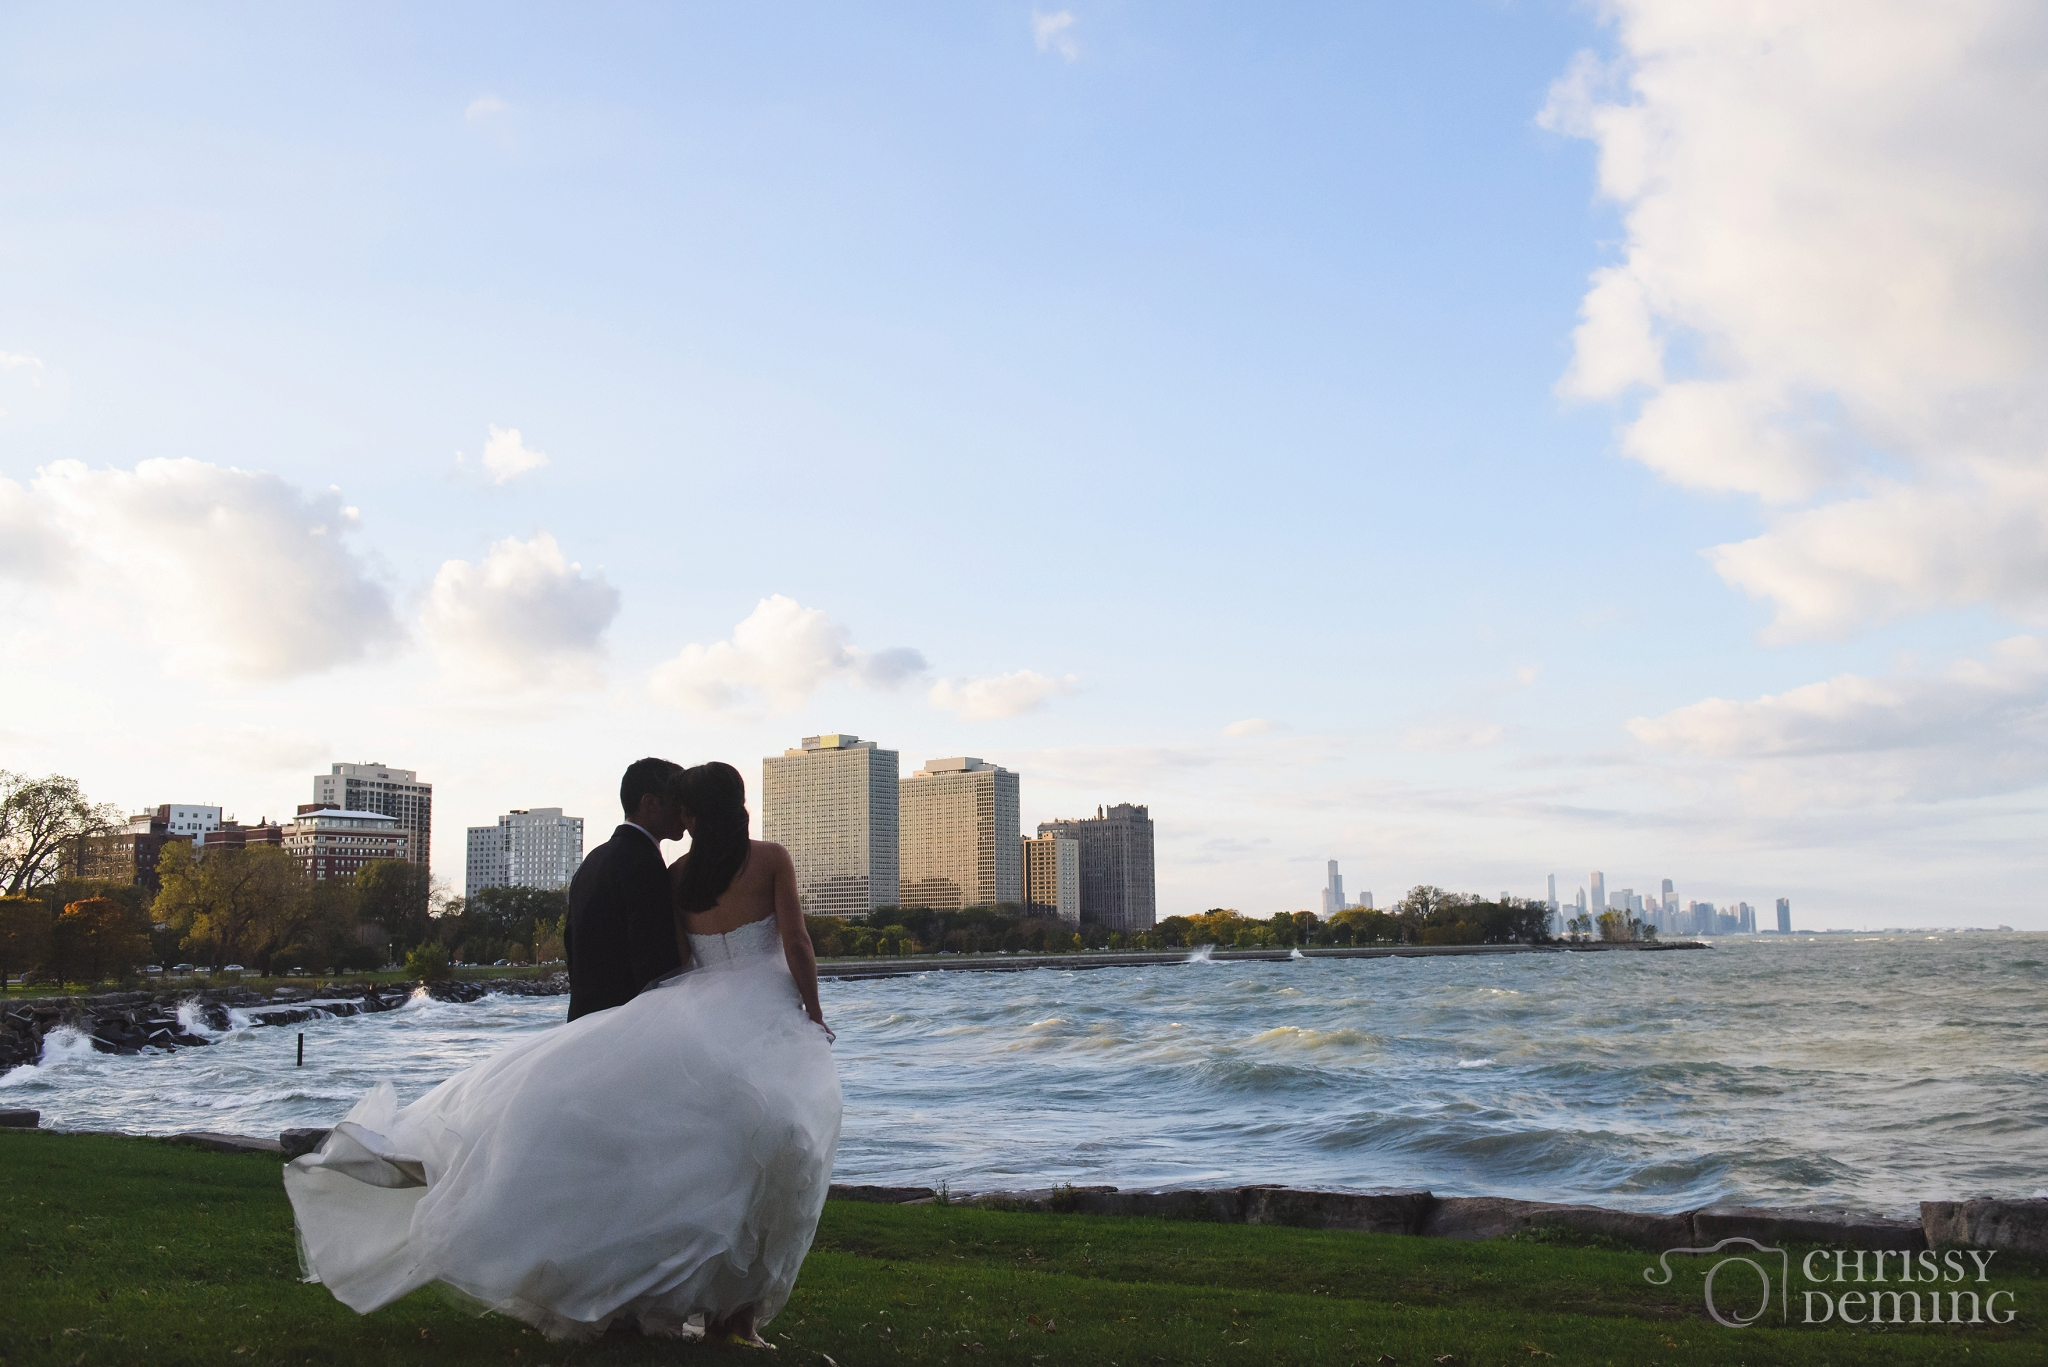 promontory_point_chicago_wedding_photography_0021.jpg